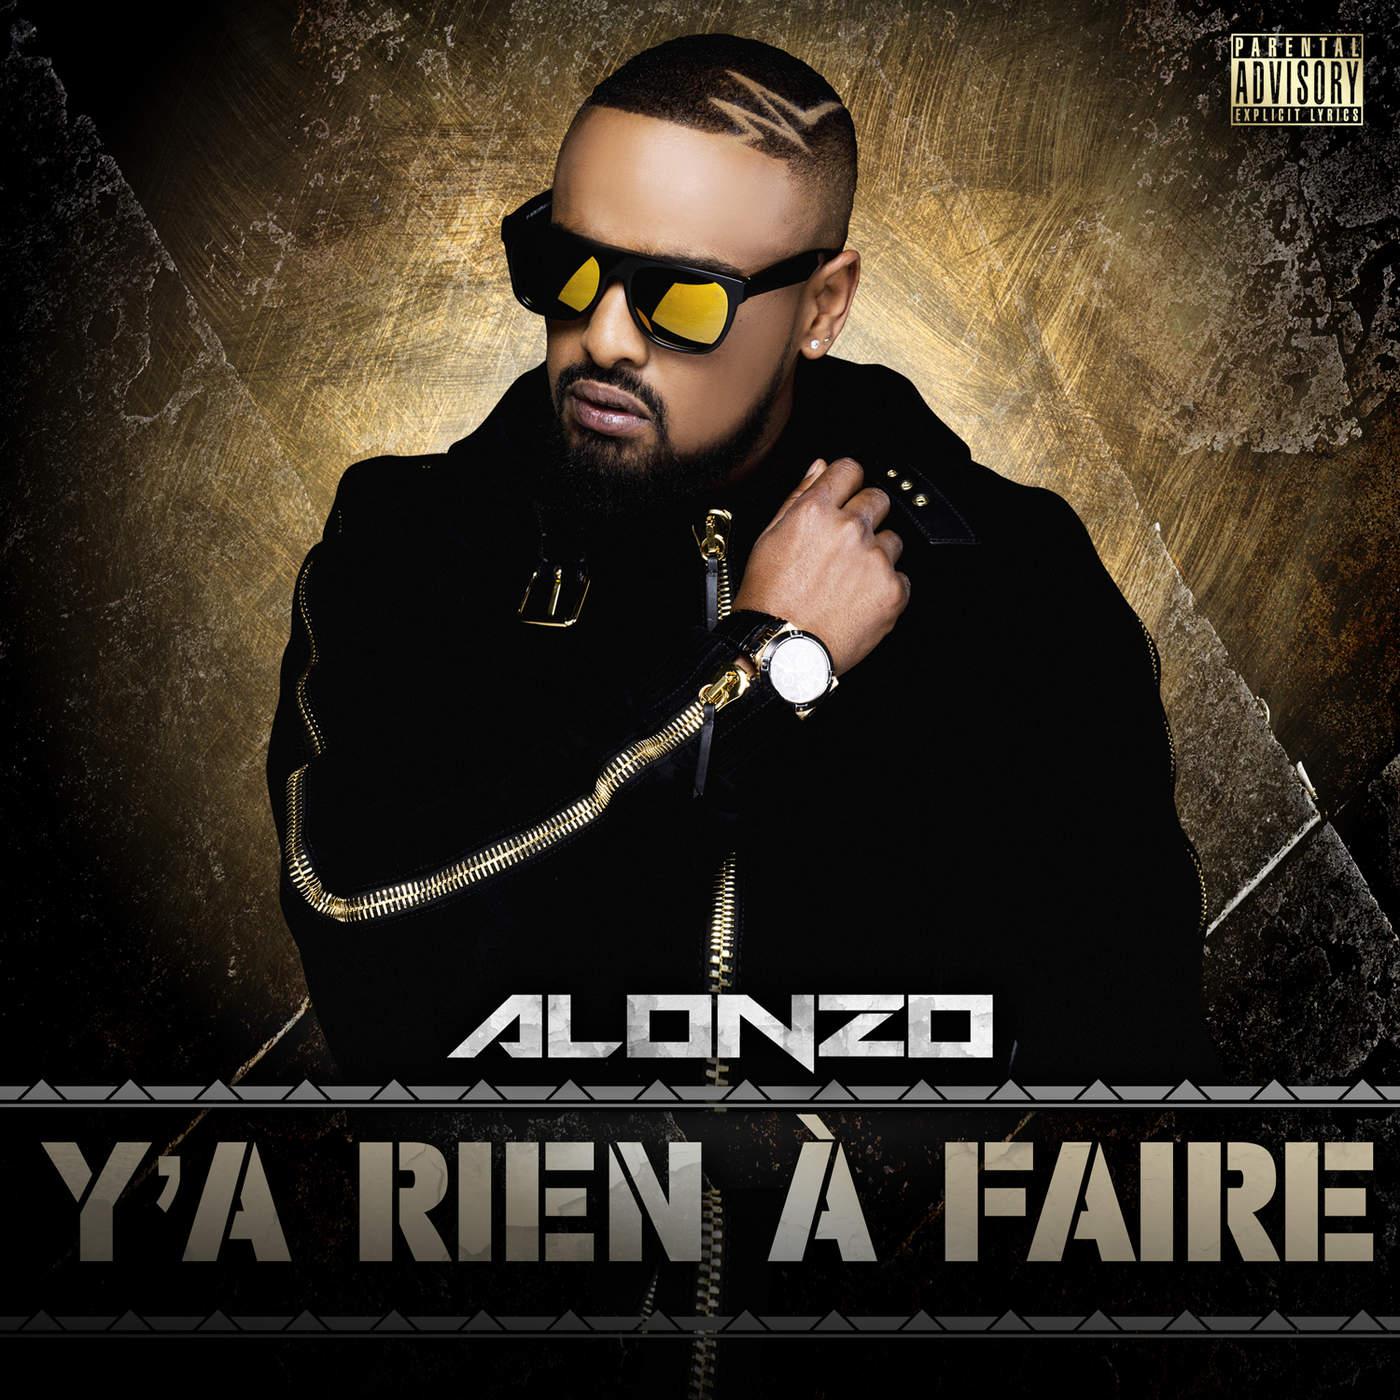 Alonzo - Y'a rien à faire - Single Cover